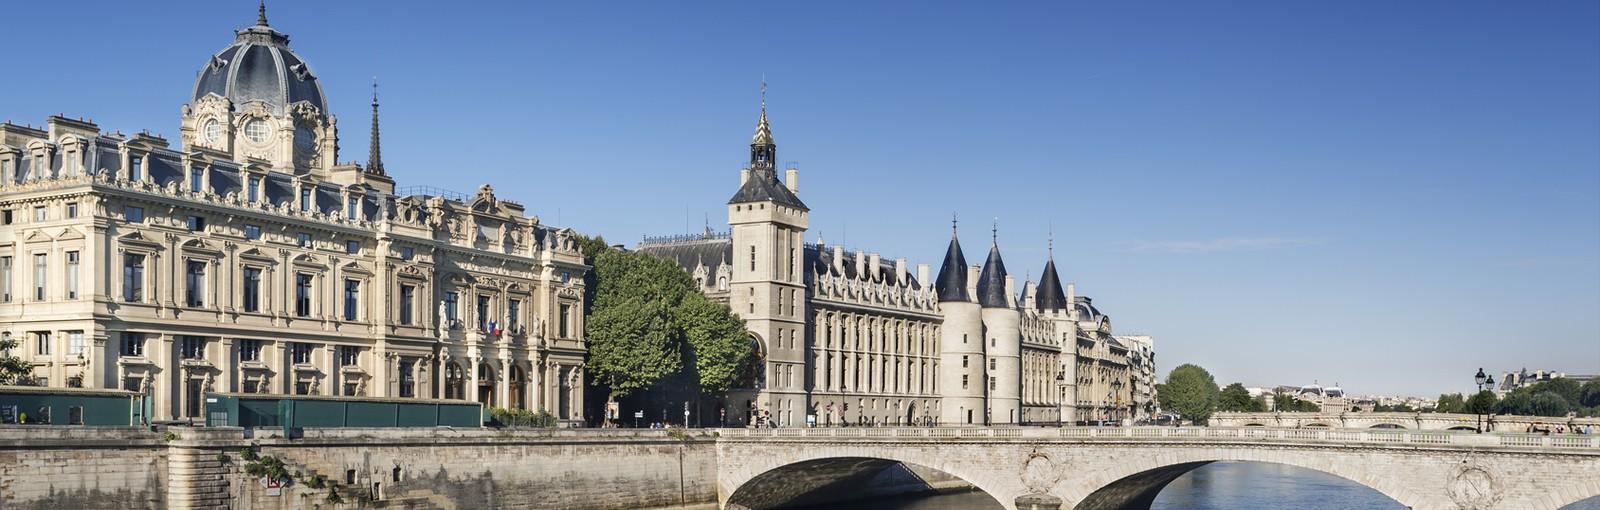 Tours Paris and the Louvre - Sightseeing - Paris Tours